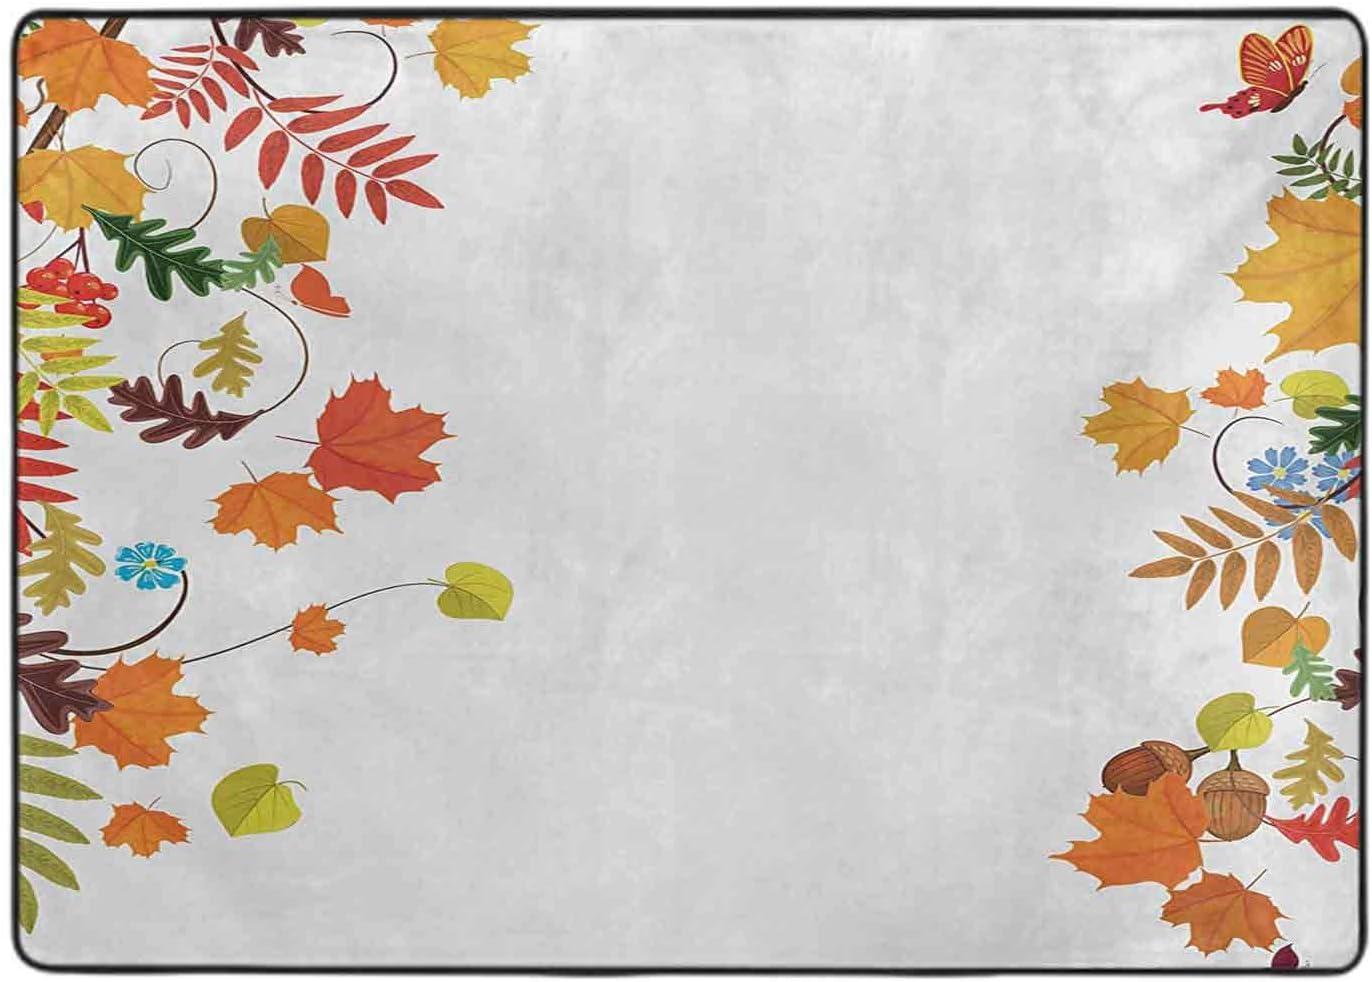 Print Area Bombing new work Rug Colorful Seasonal Frame Fall Ranking TOP6 Maple Aspen Leaves